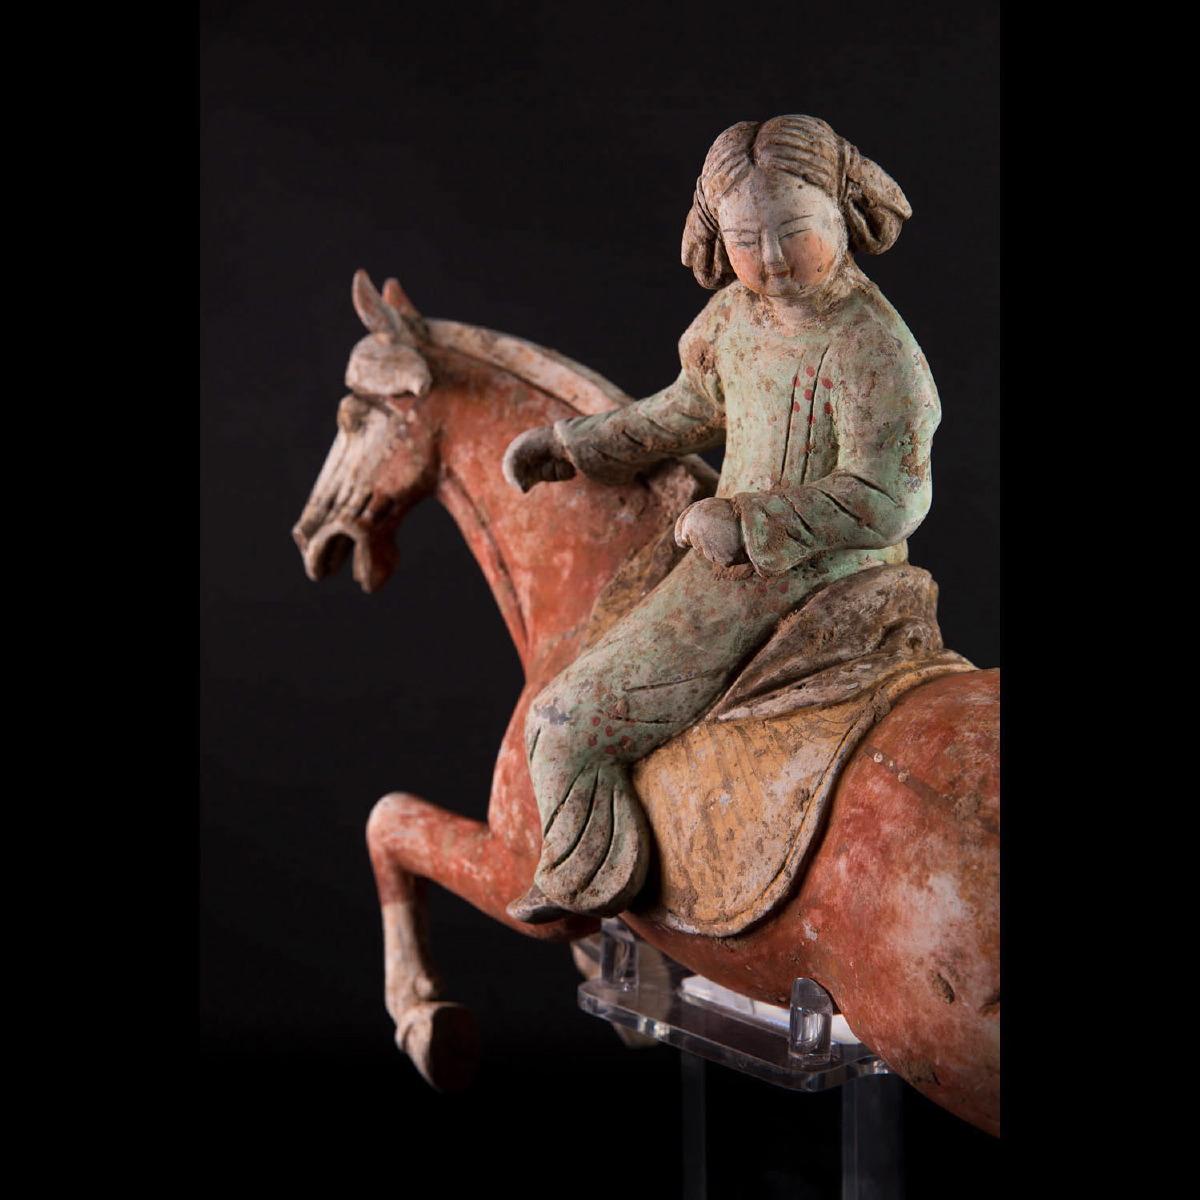 Photo of nicepair-polo-ladies-horses-tang-galerie-golconda